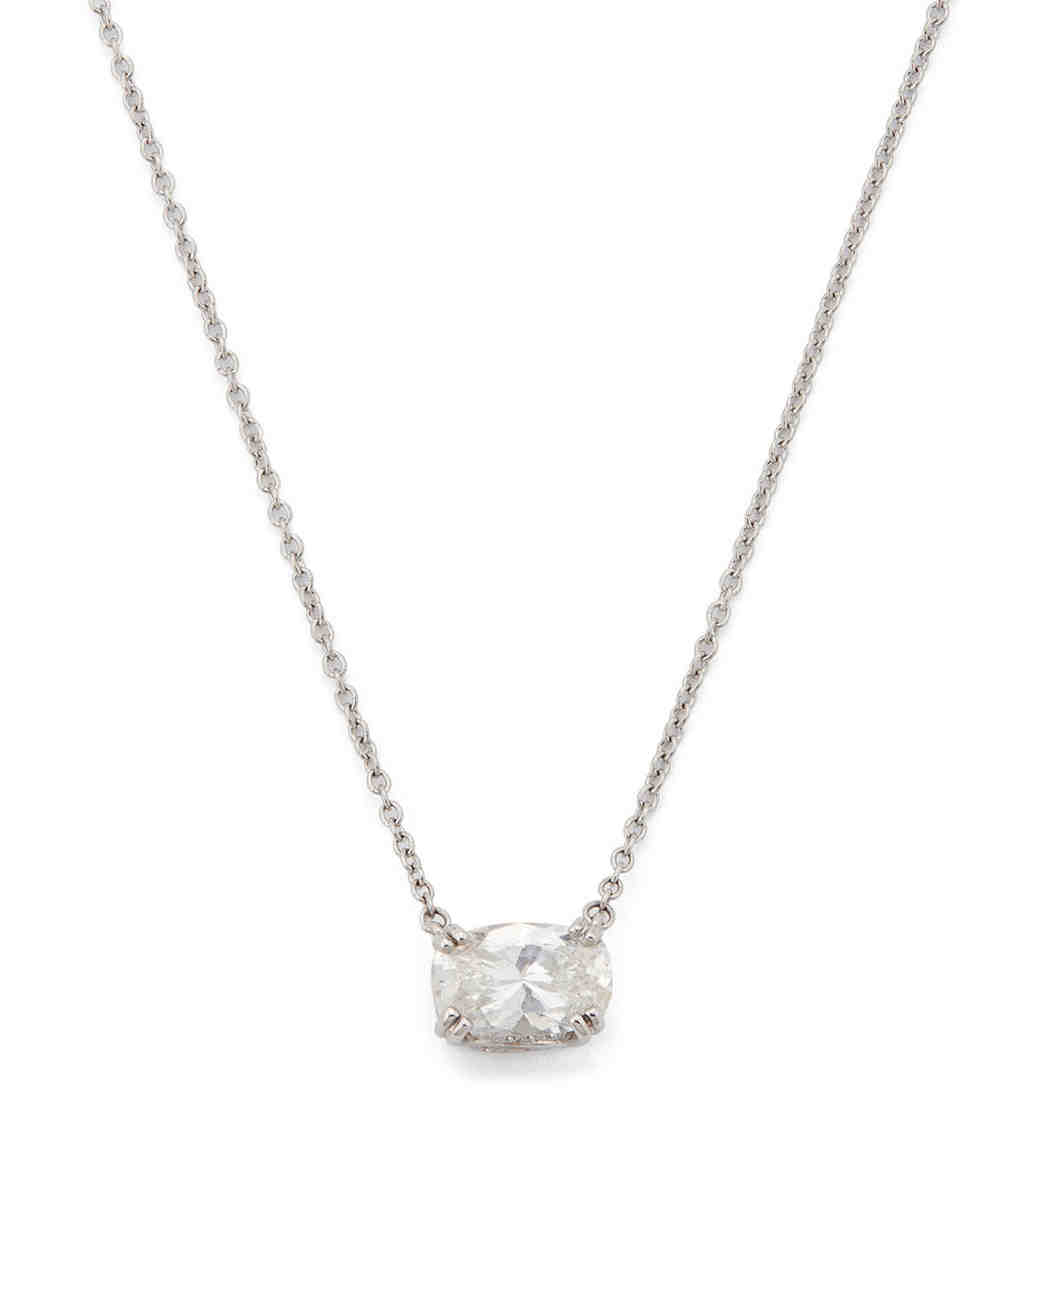 Key Charm with White Diamonds Necklace